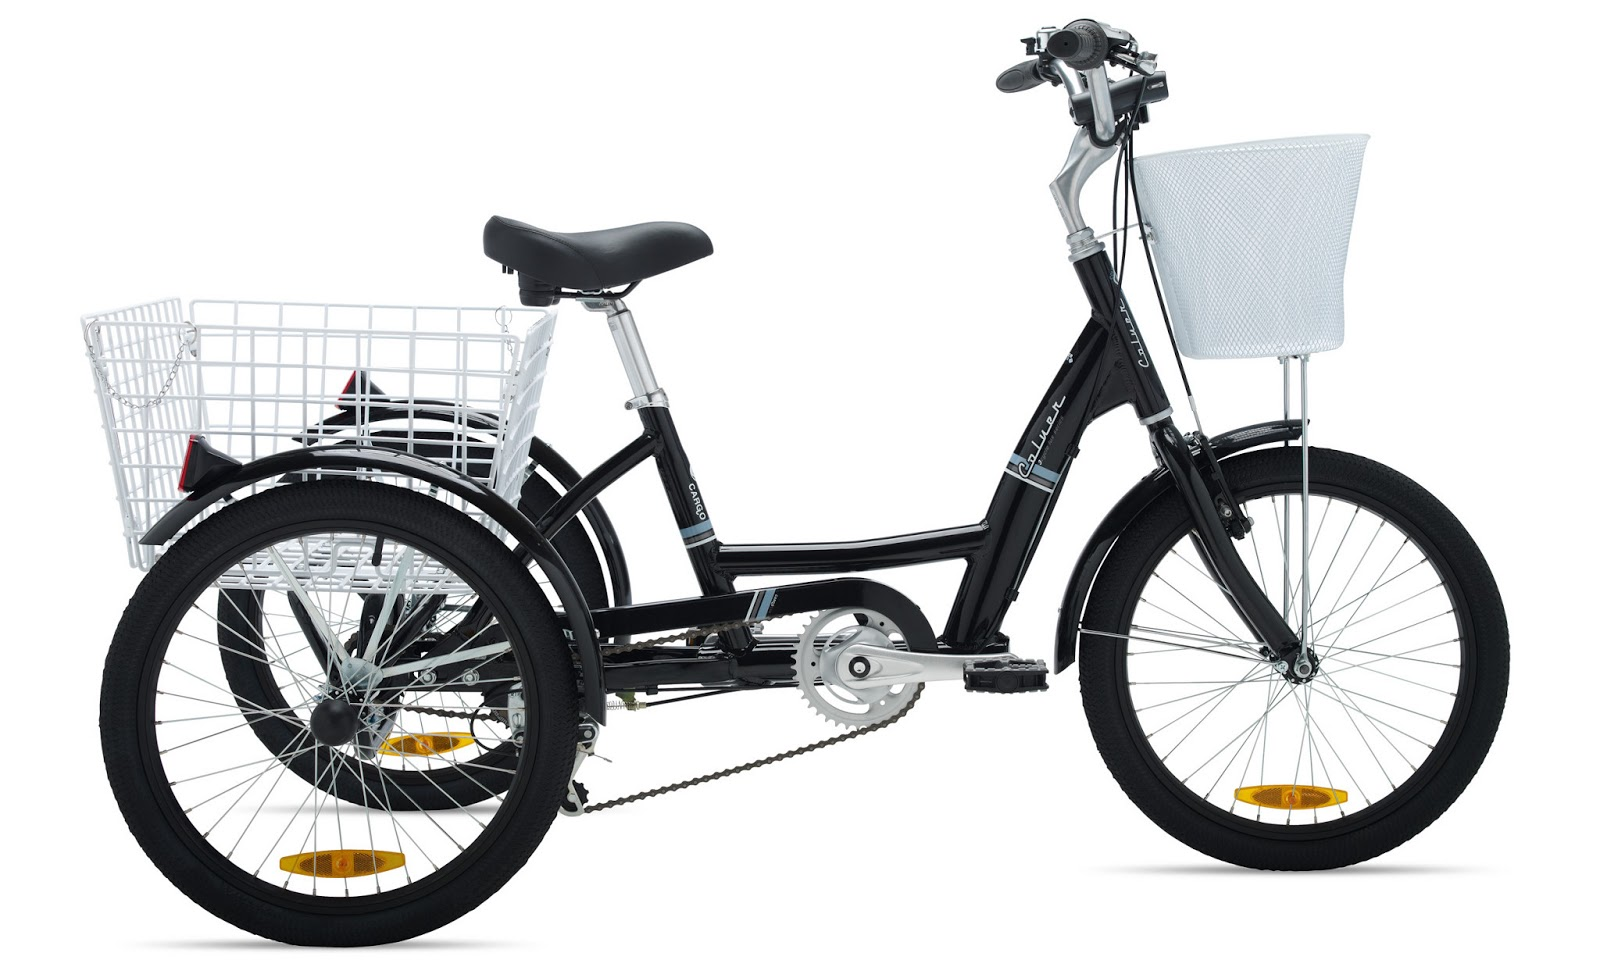 Bicicletas Grandes - Bicicletas para Adultos en Mercado